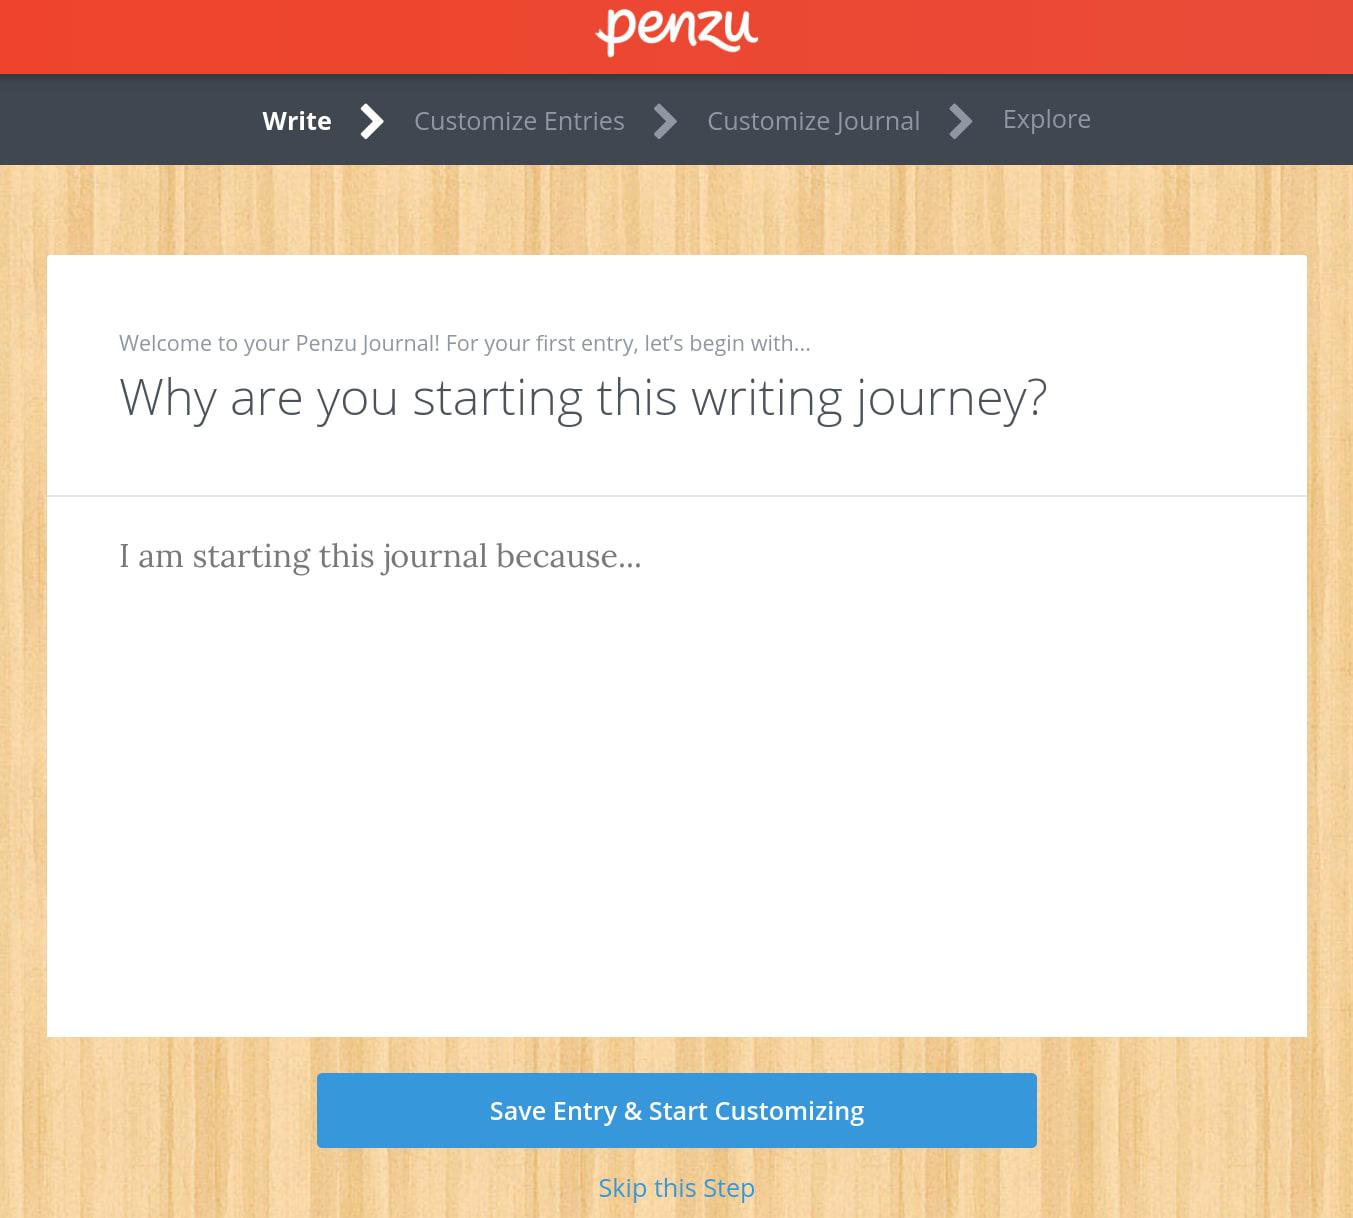 Penzu Getting Started Wizard